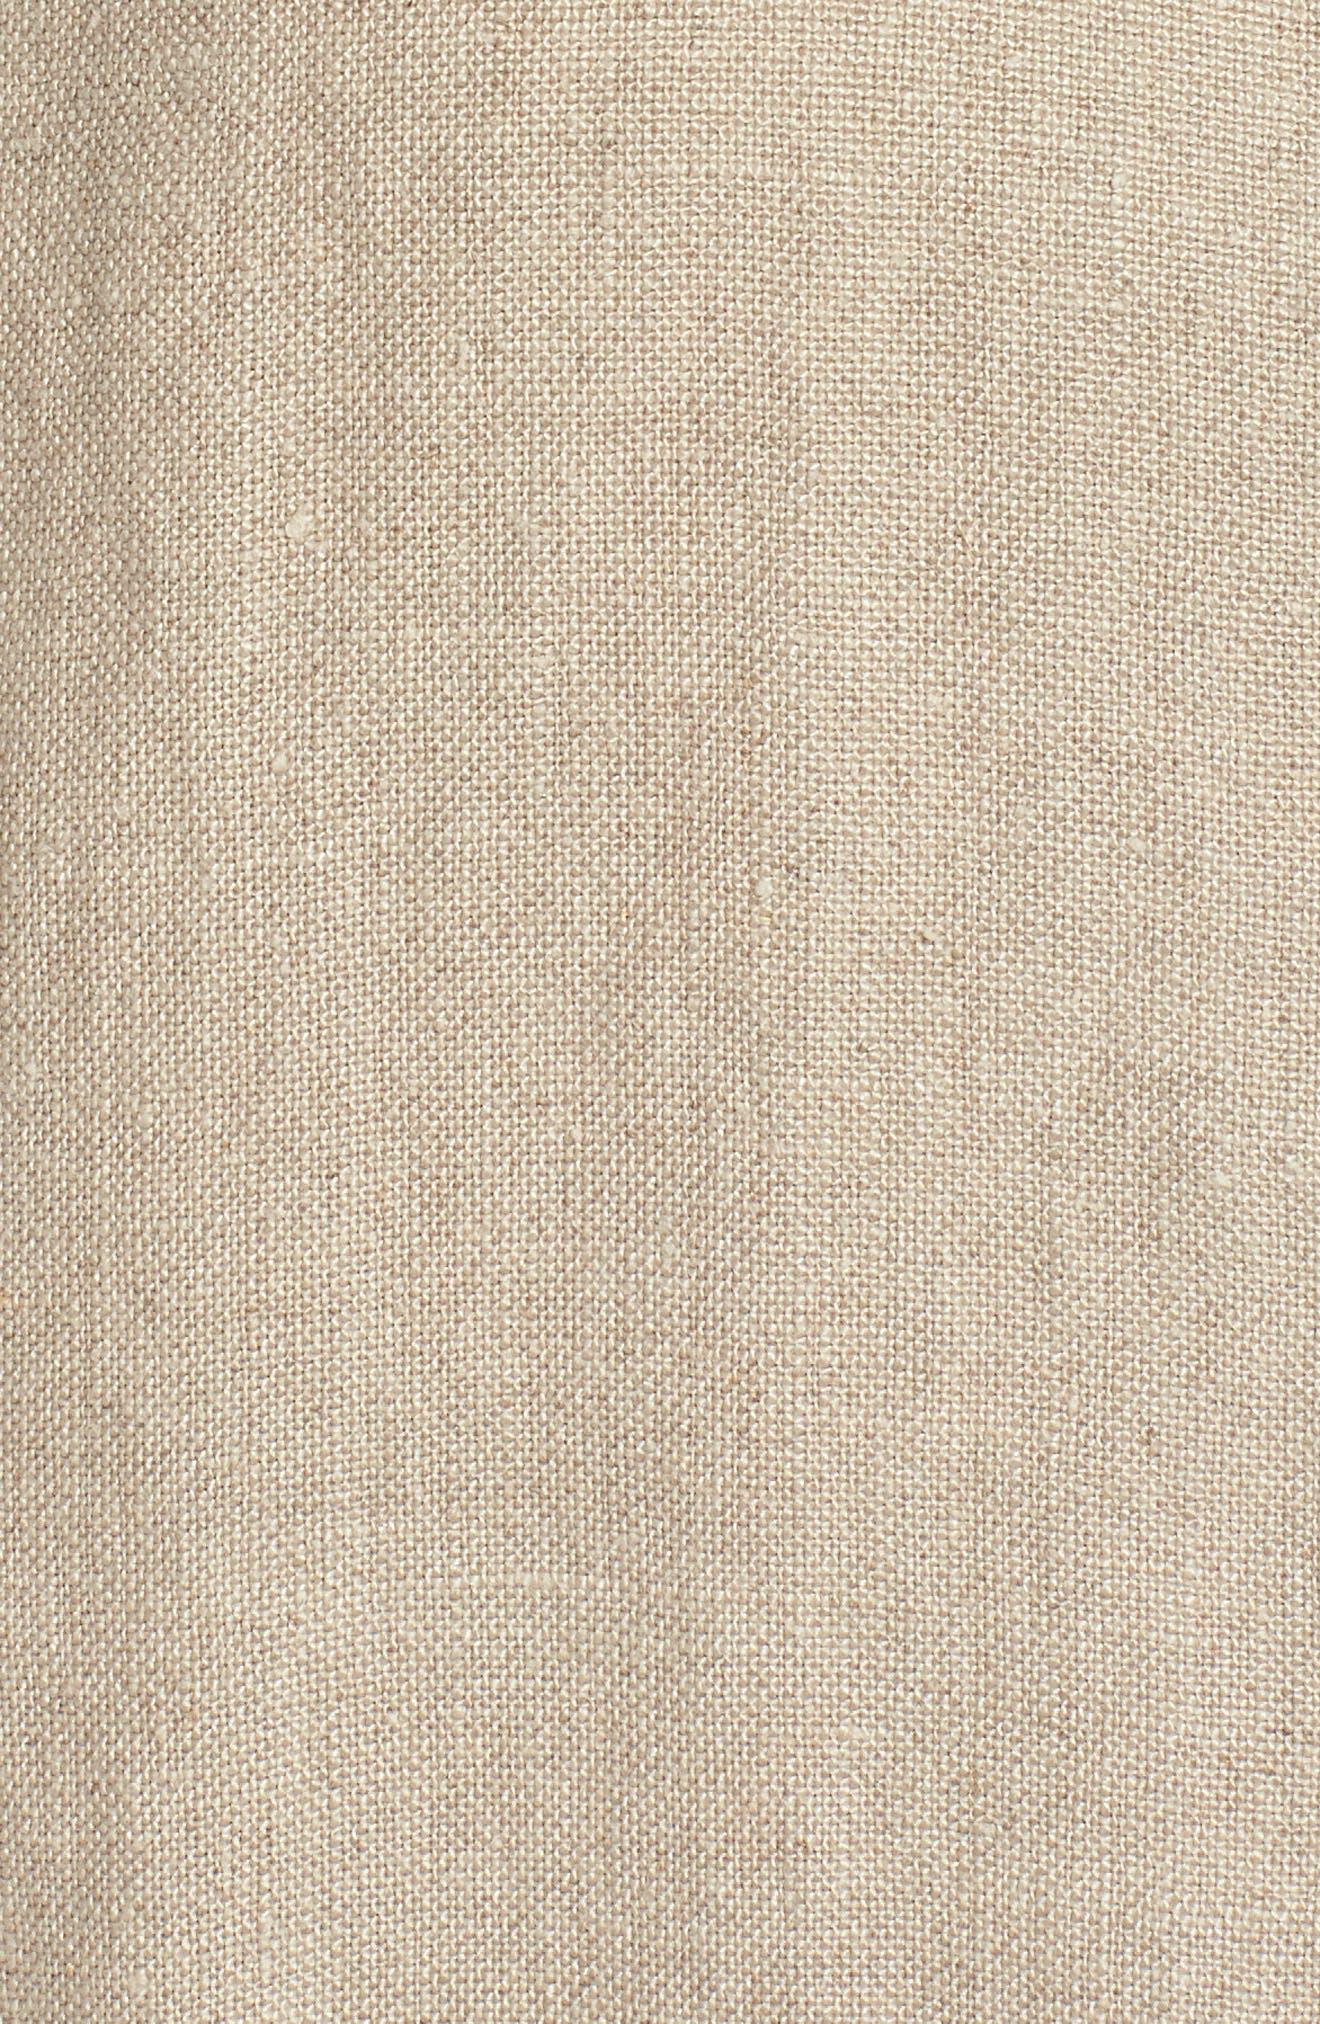 Organic Linen Jacket,                             Alternate thumbnail 6, color,                             Undyed Natural